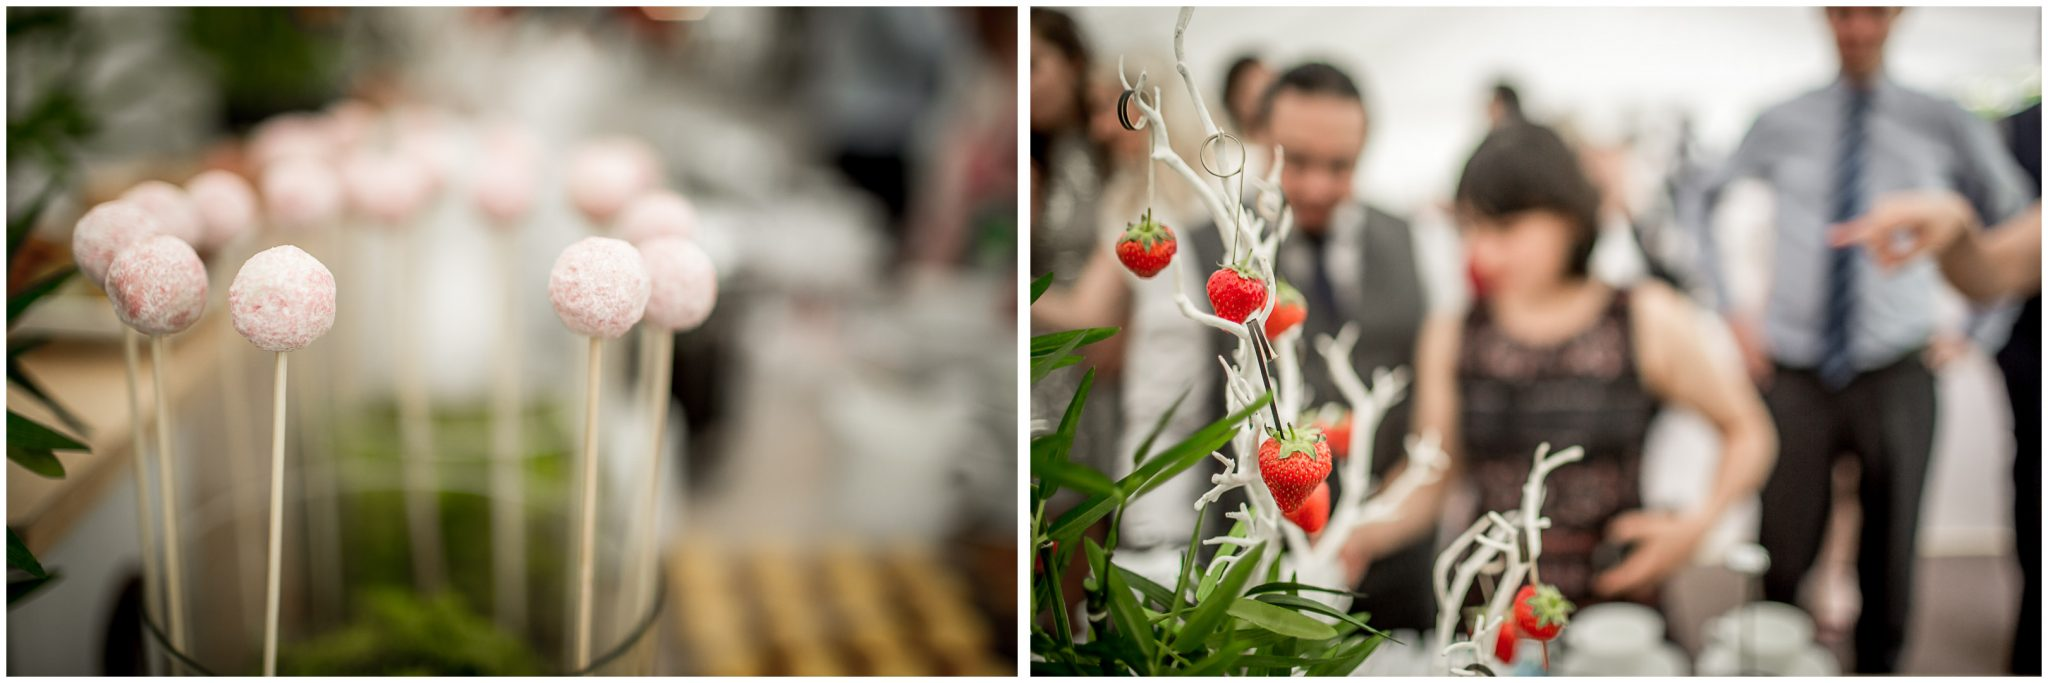 Dessert details from high-concept wedding breakfast